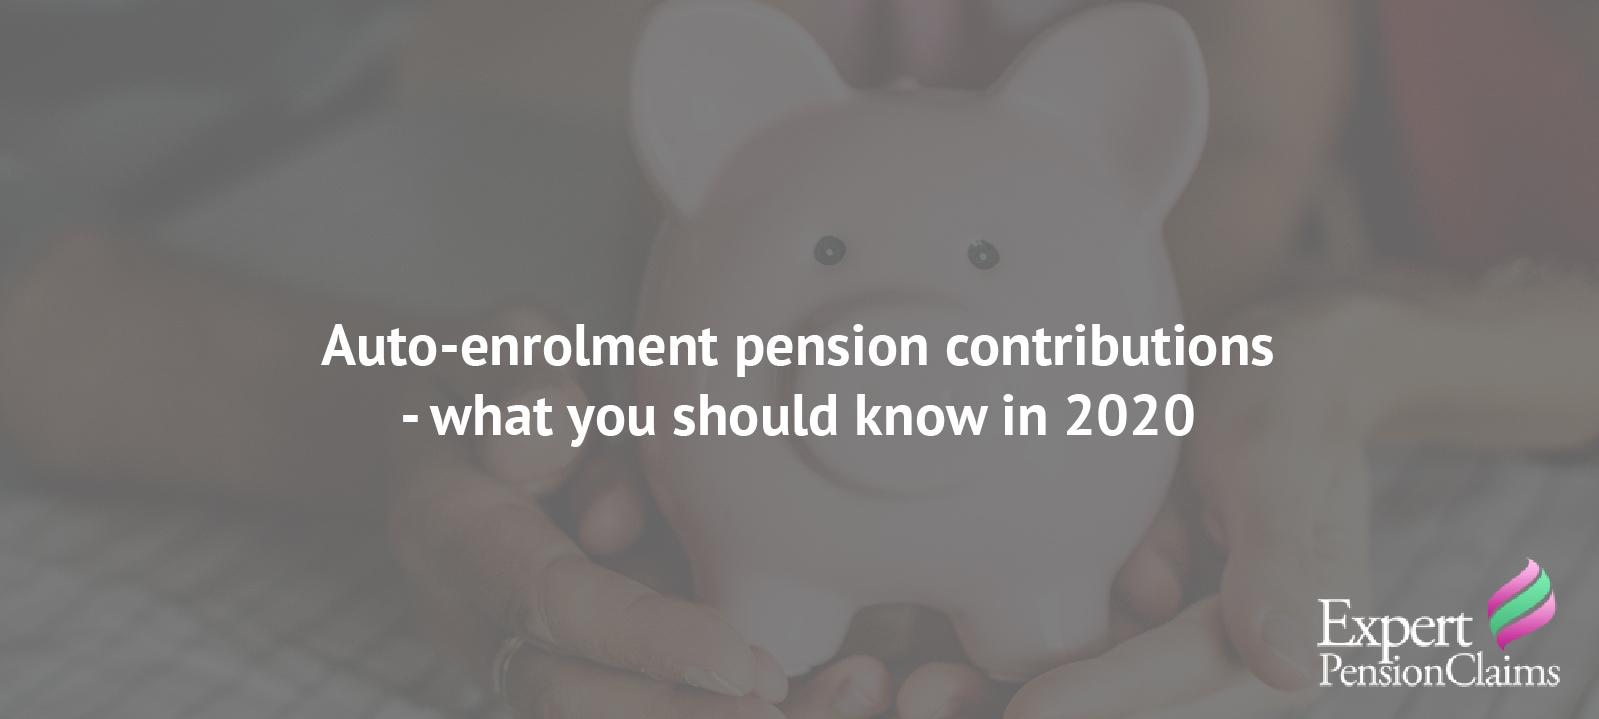 auto-enrollment pensions banner